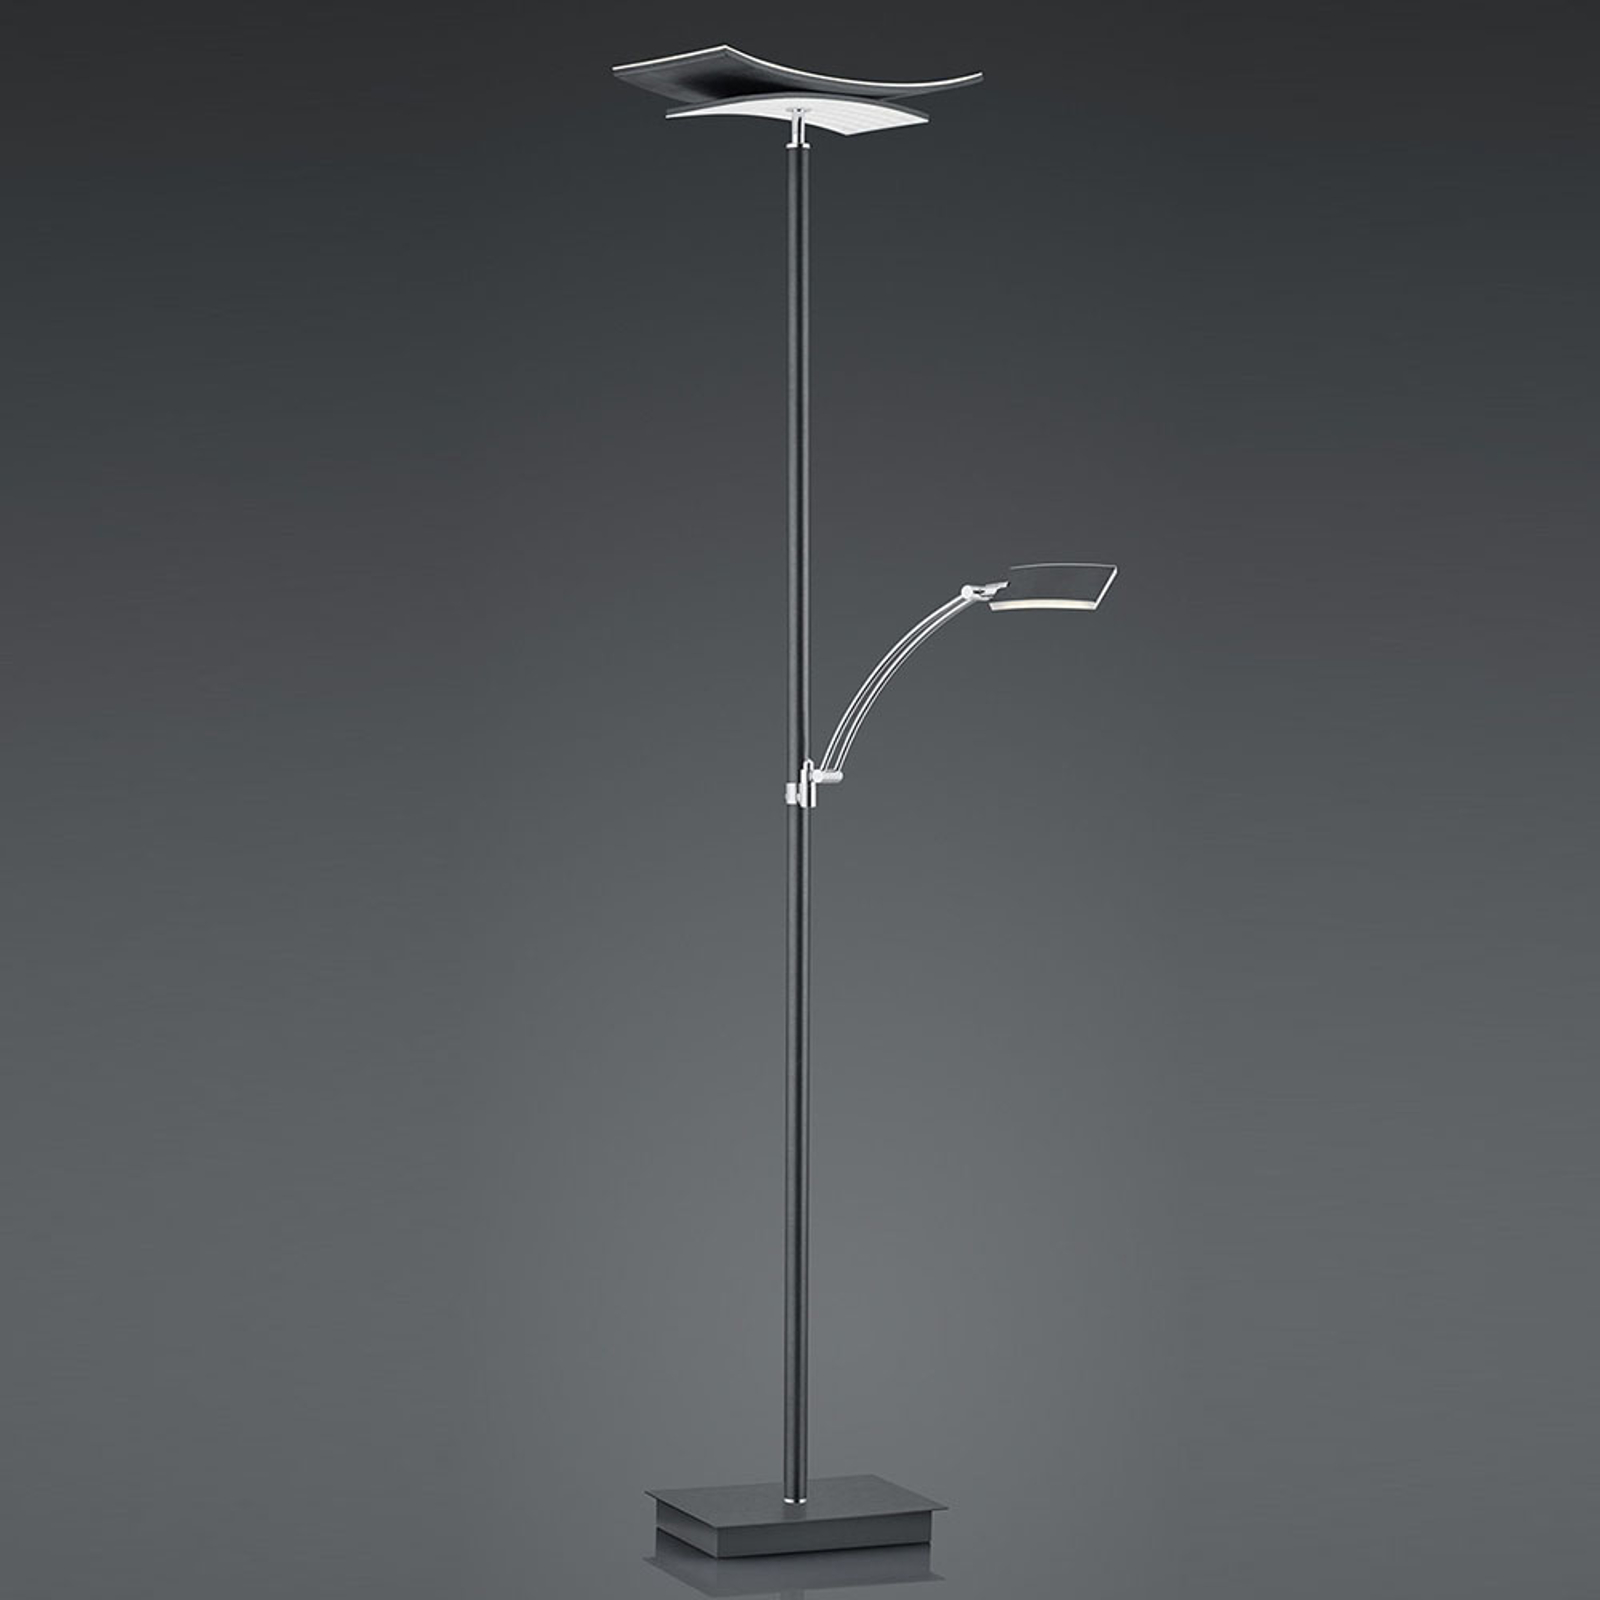 B-Leuchten Liberty lampadaire liseuse anthracite